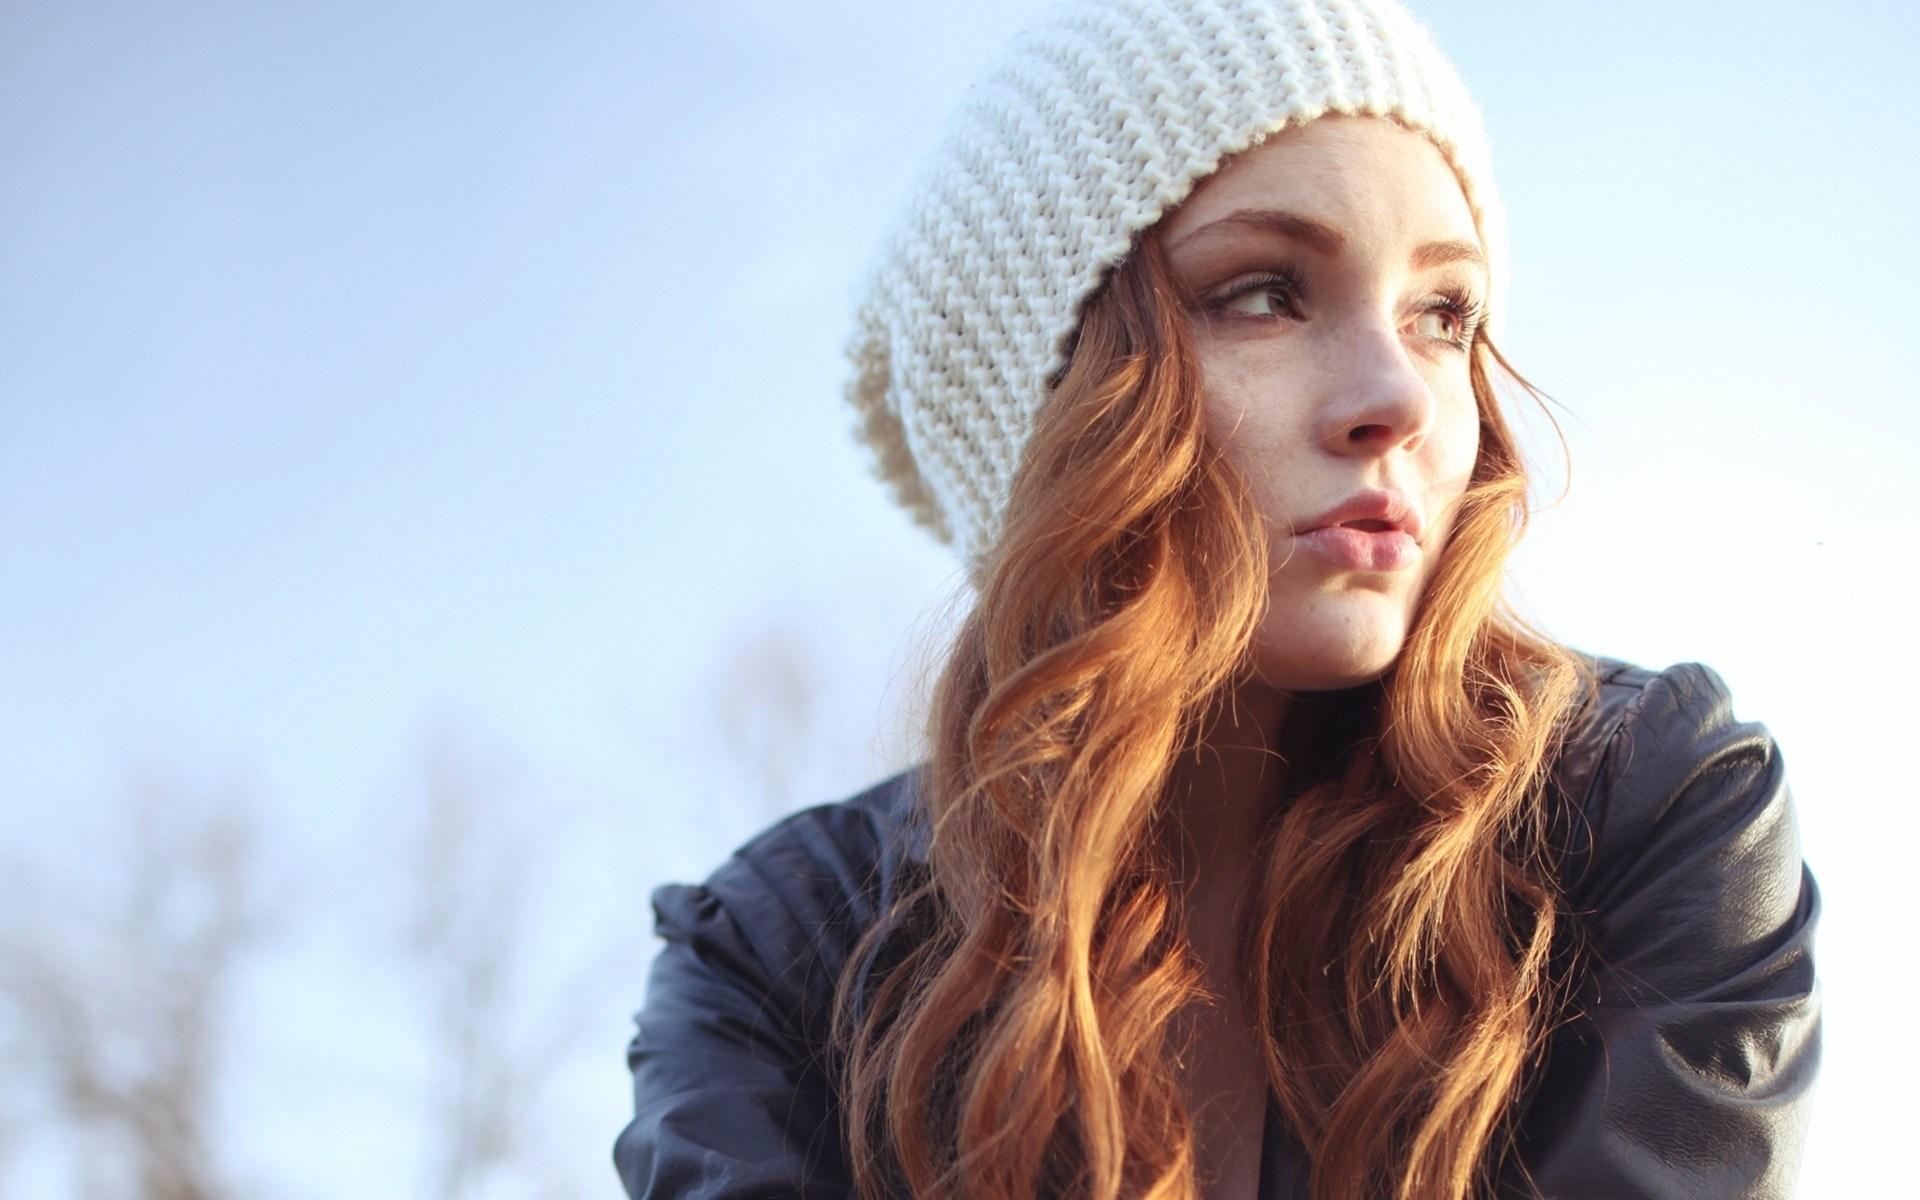 pretty girl hat wallpaper 43330